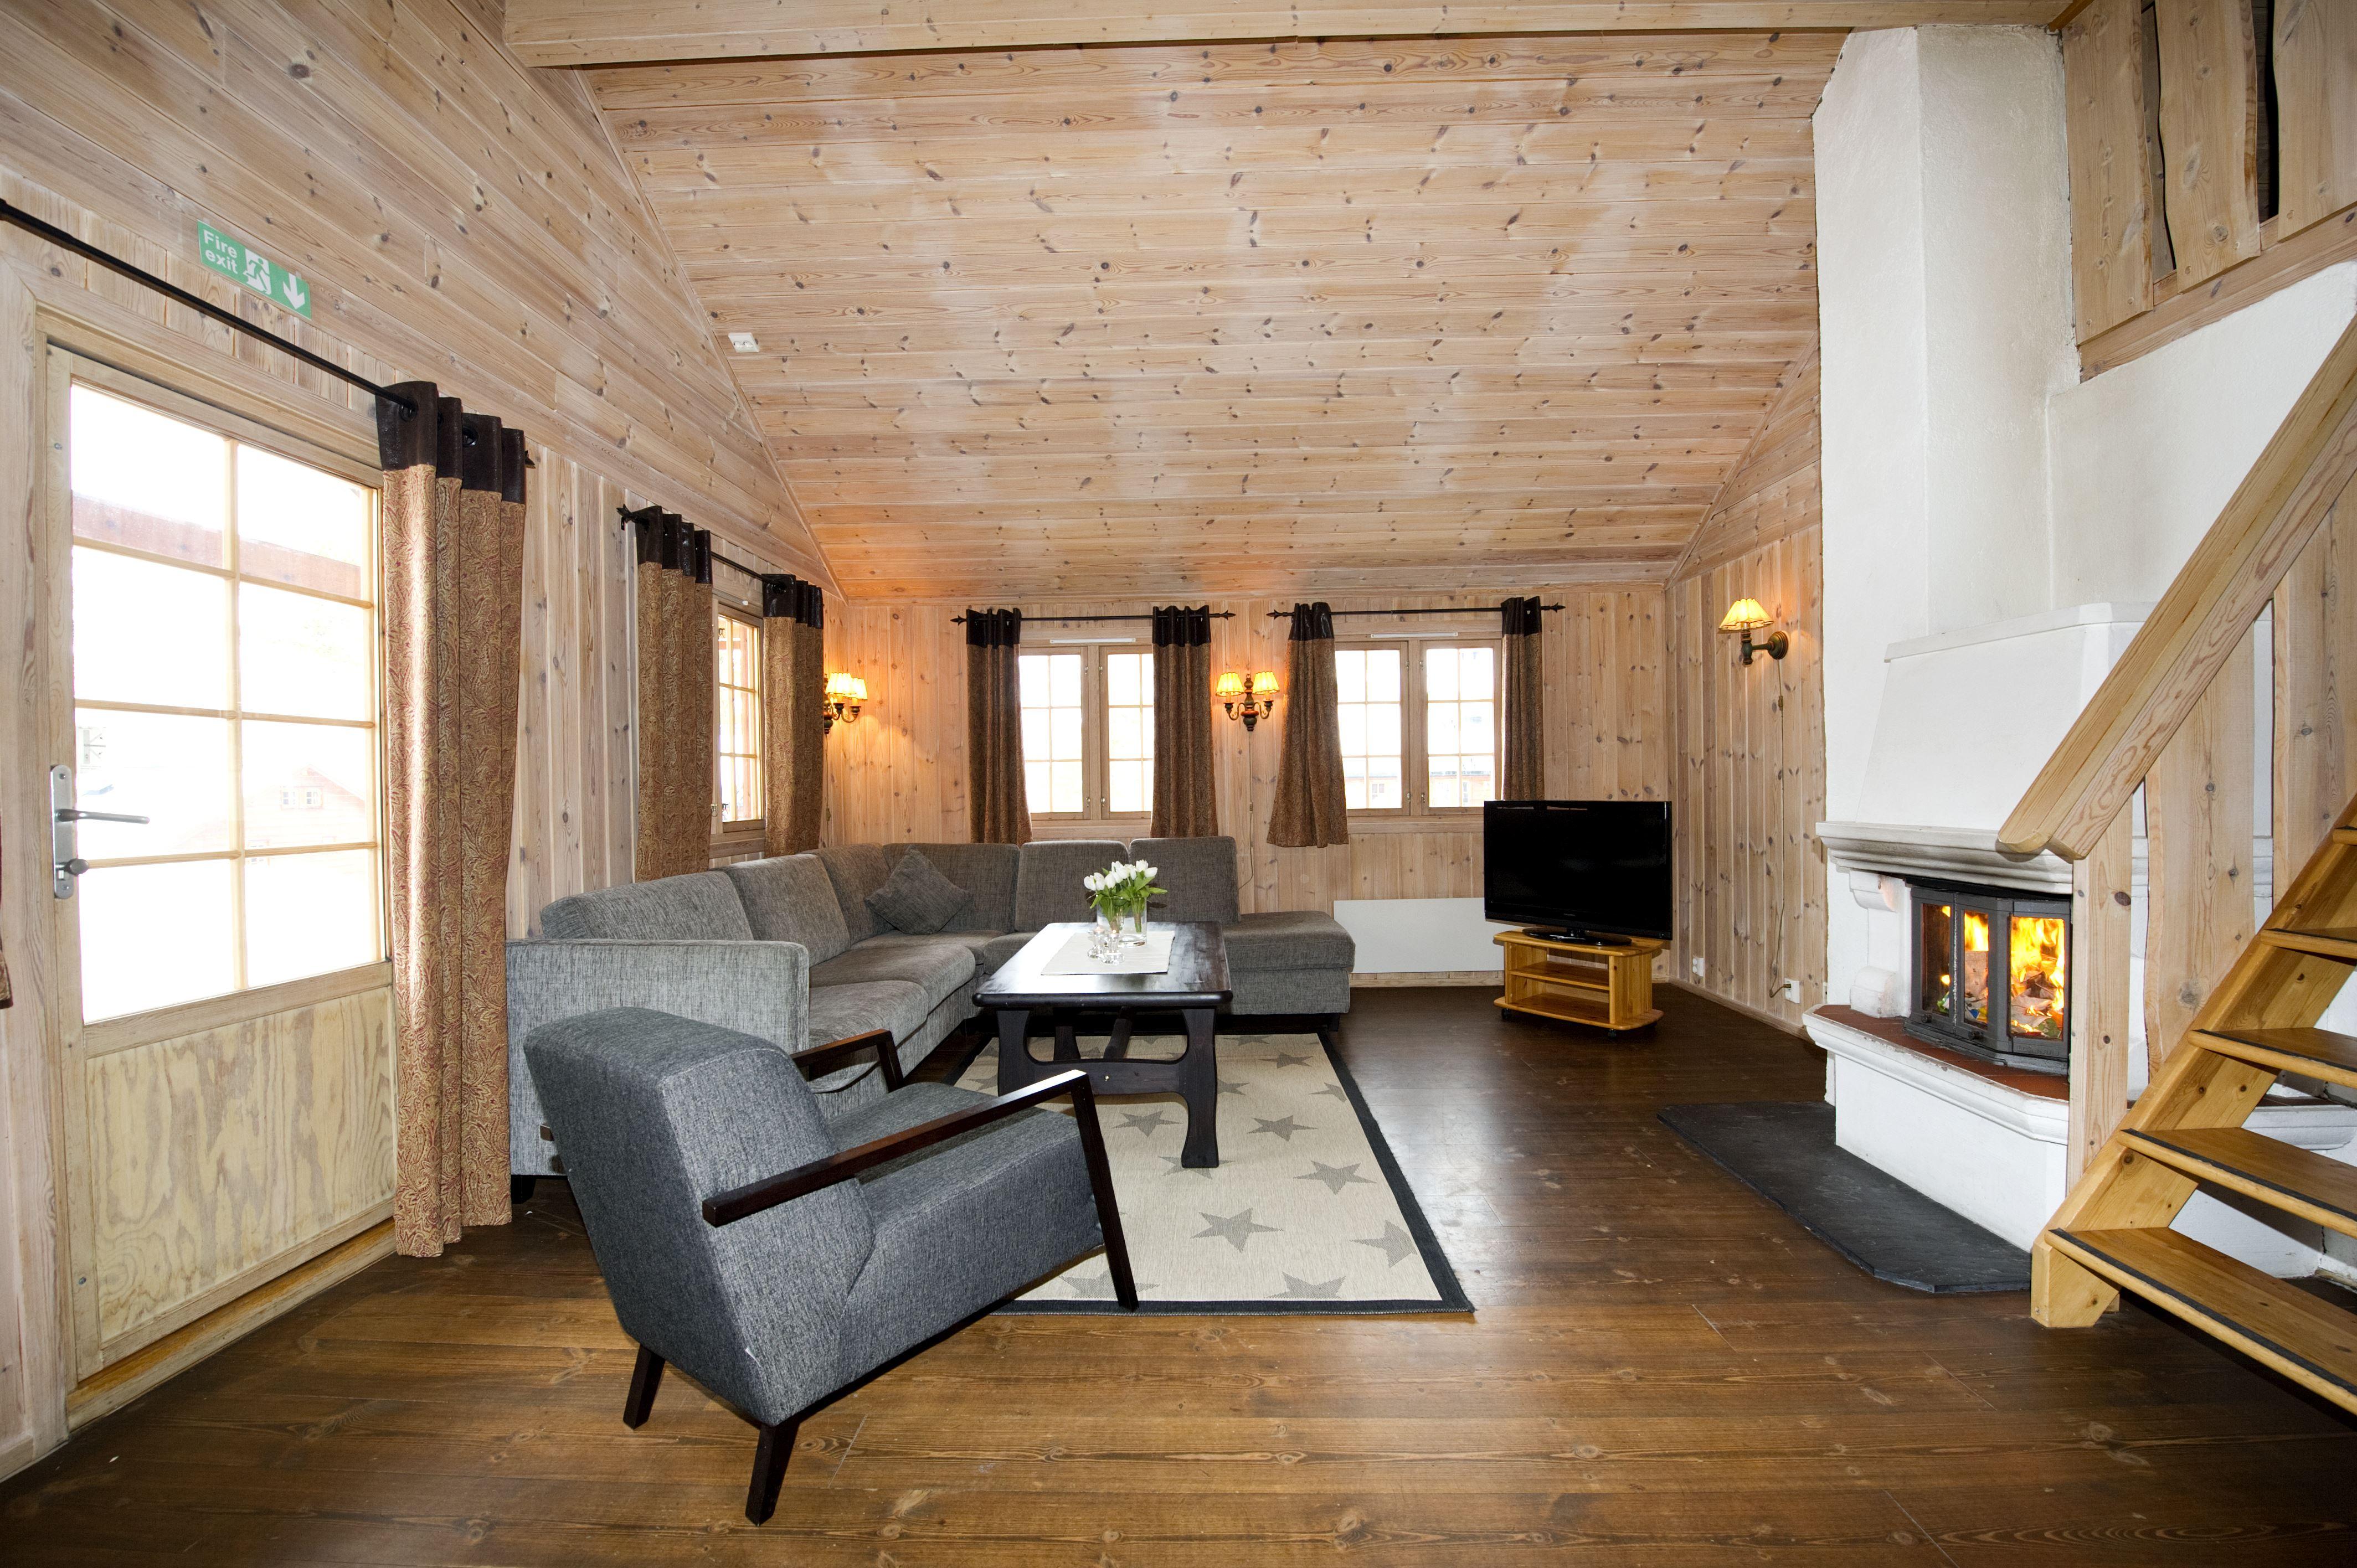 Stue / Living area Geilolia Hyttetun 10sengshytte / 10bed cabin